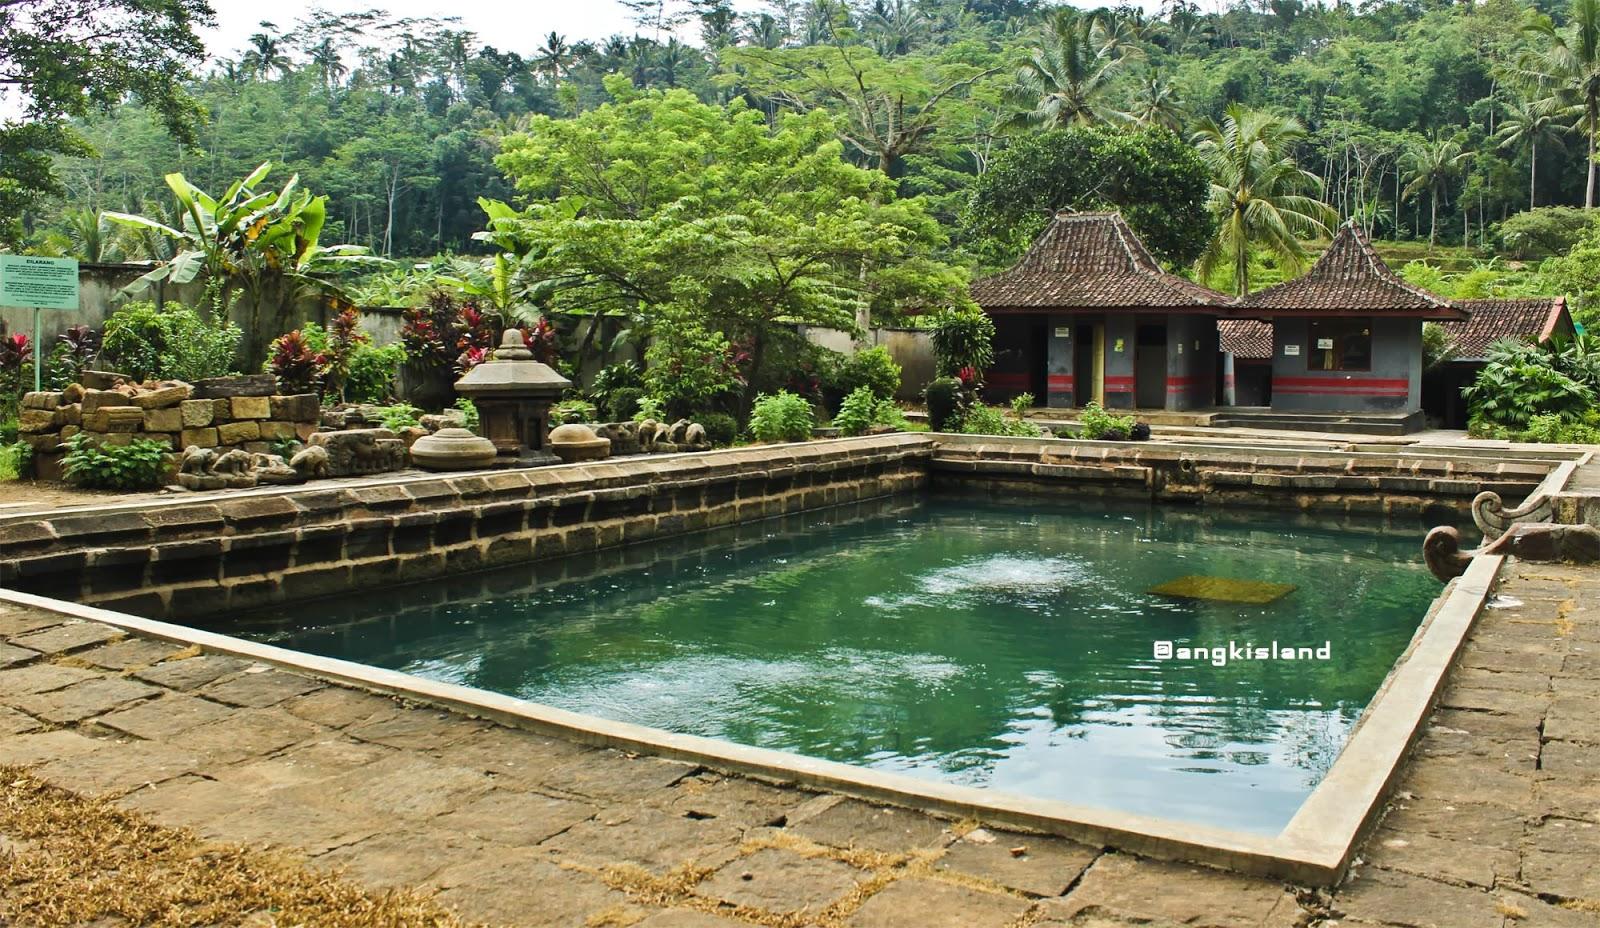 kolam candi umbul